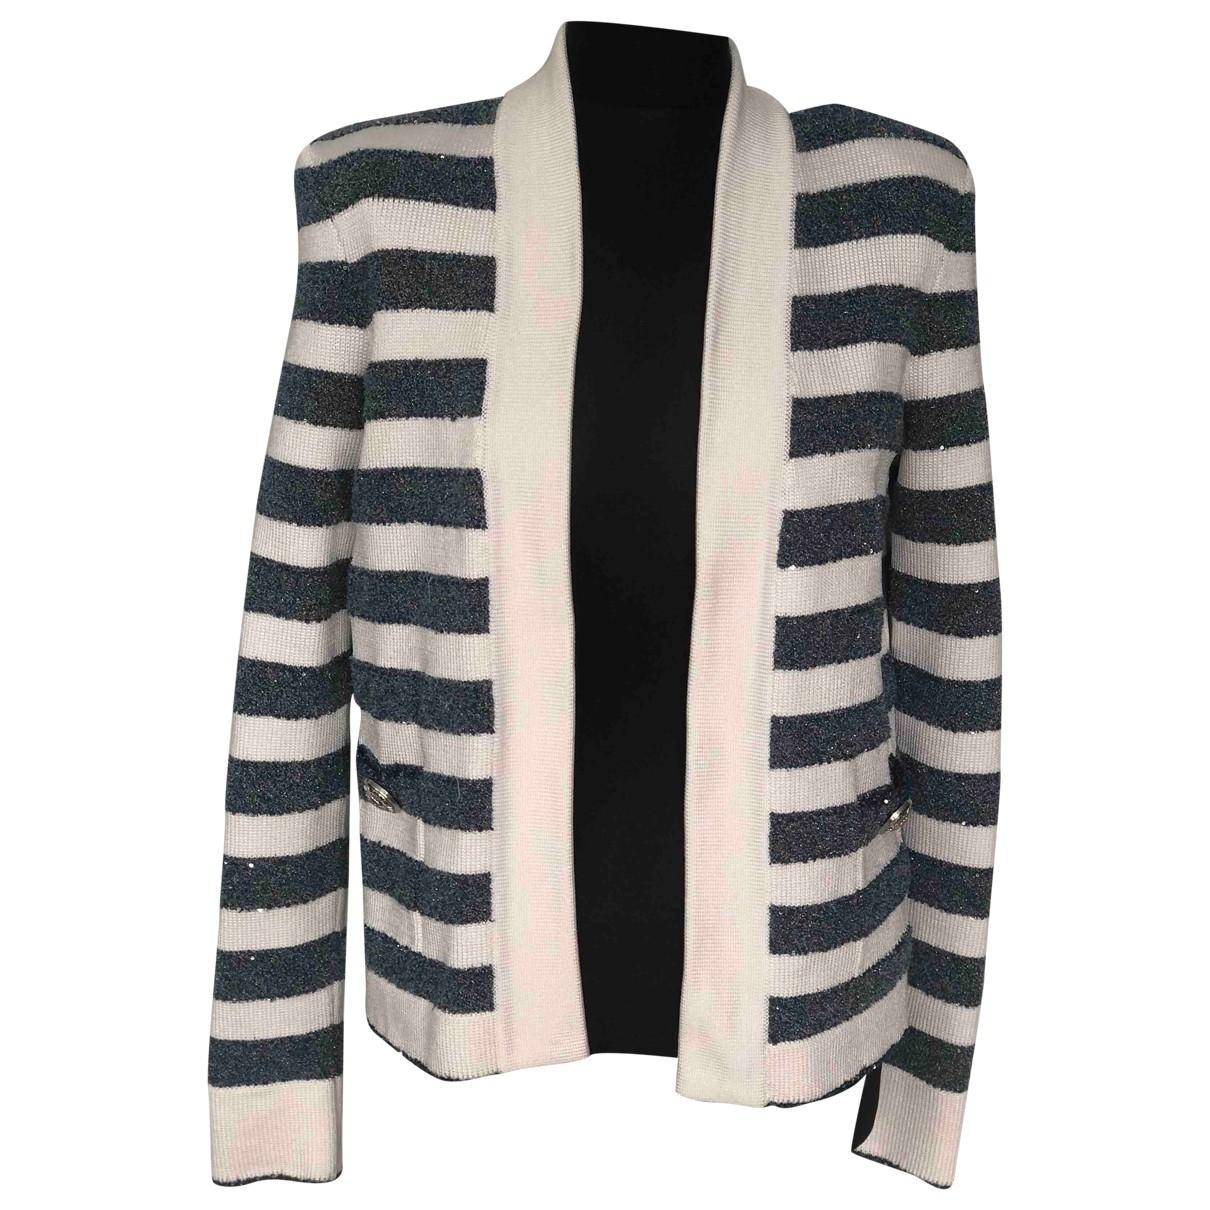 Balmain \N Blue jacket for Women S International